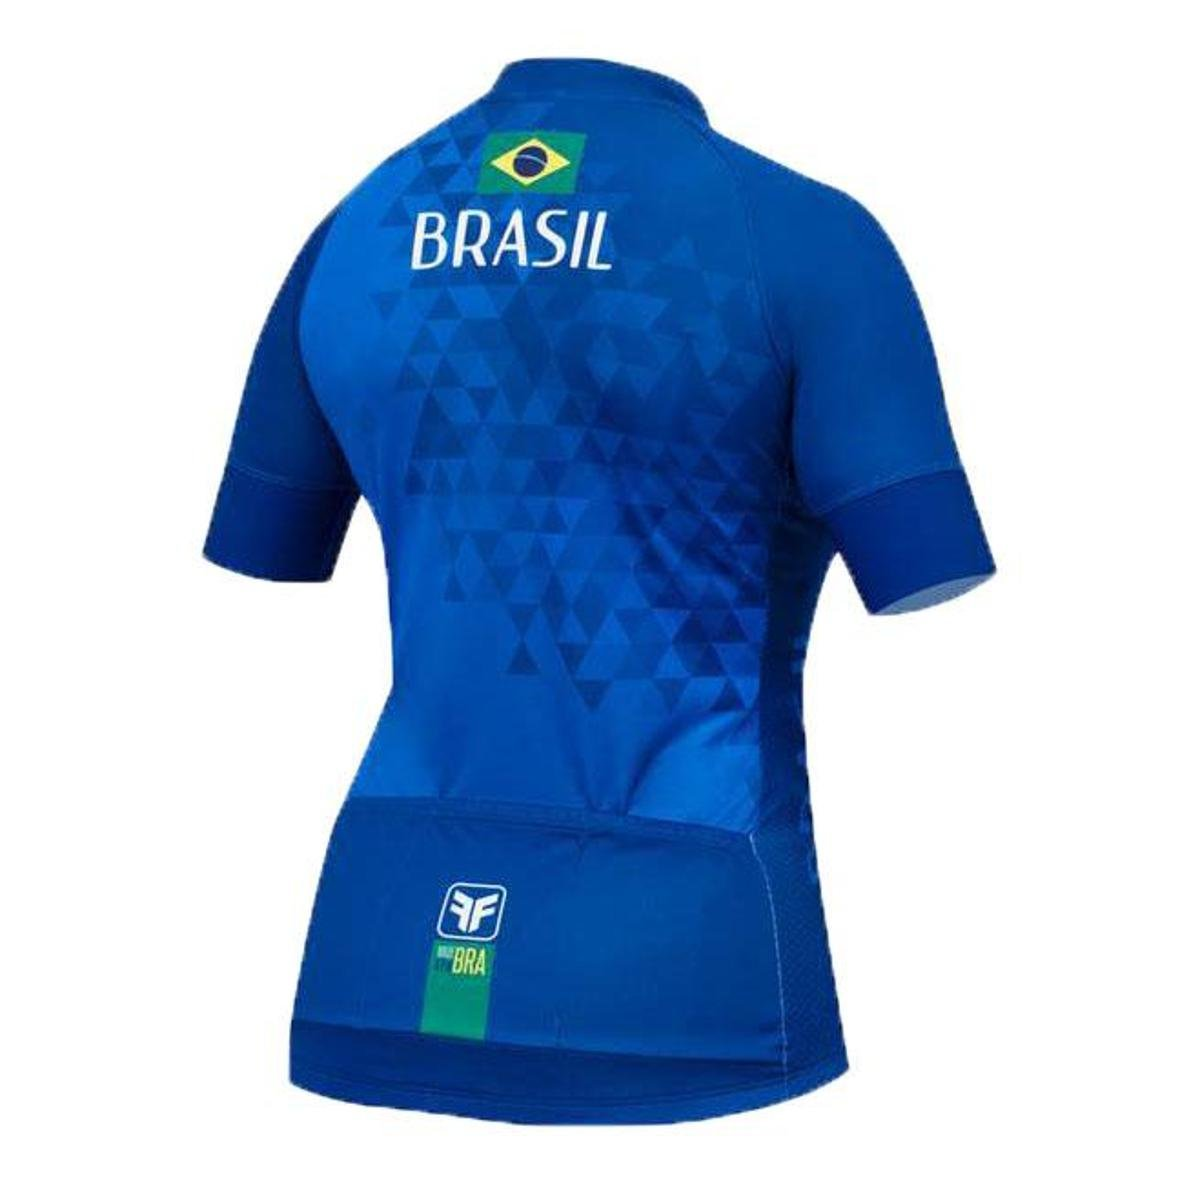 ... Camisa Force Brasil Azul Free Feminina Force Free Azul Camisa Brasil  Feminina rrqw18A6 91ec1d6bef35c